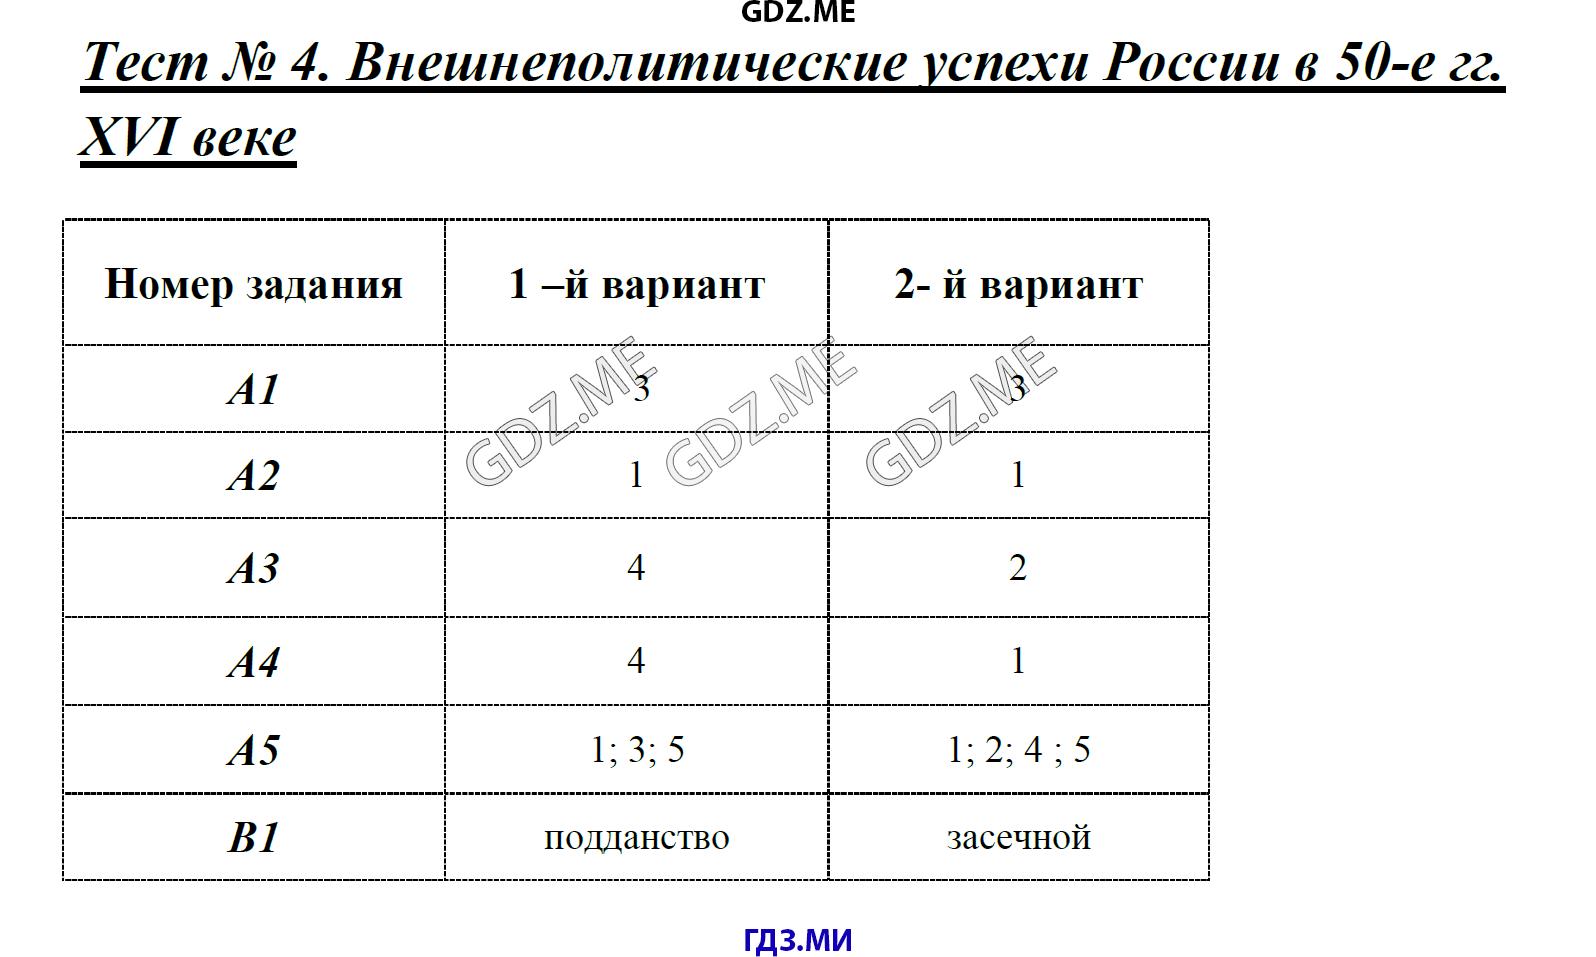 ГДЗ решебник по истории класс КИМ Волкова